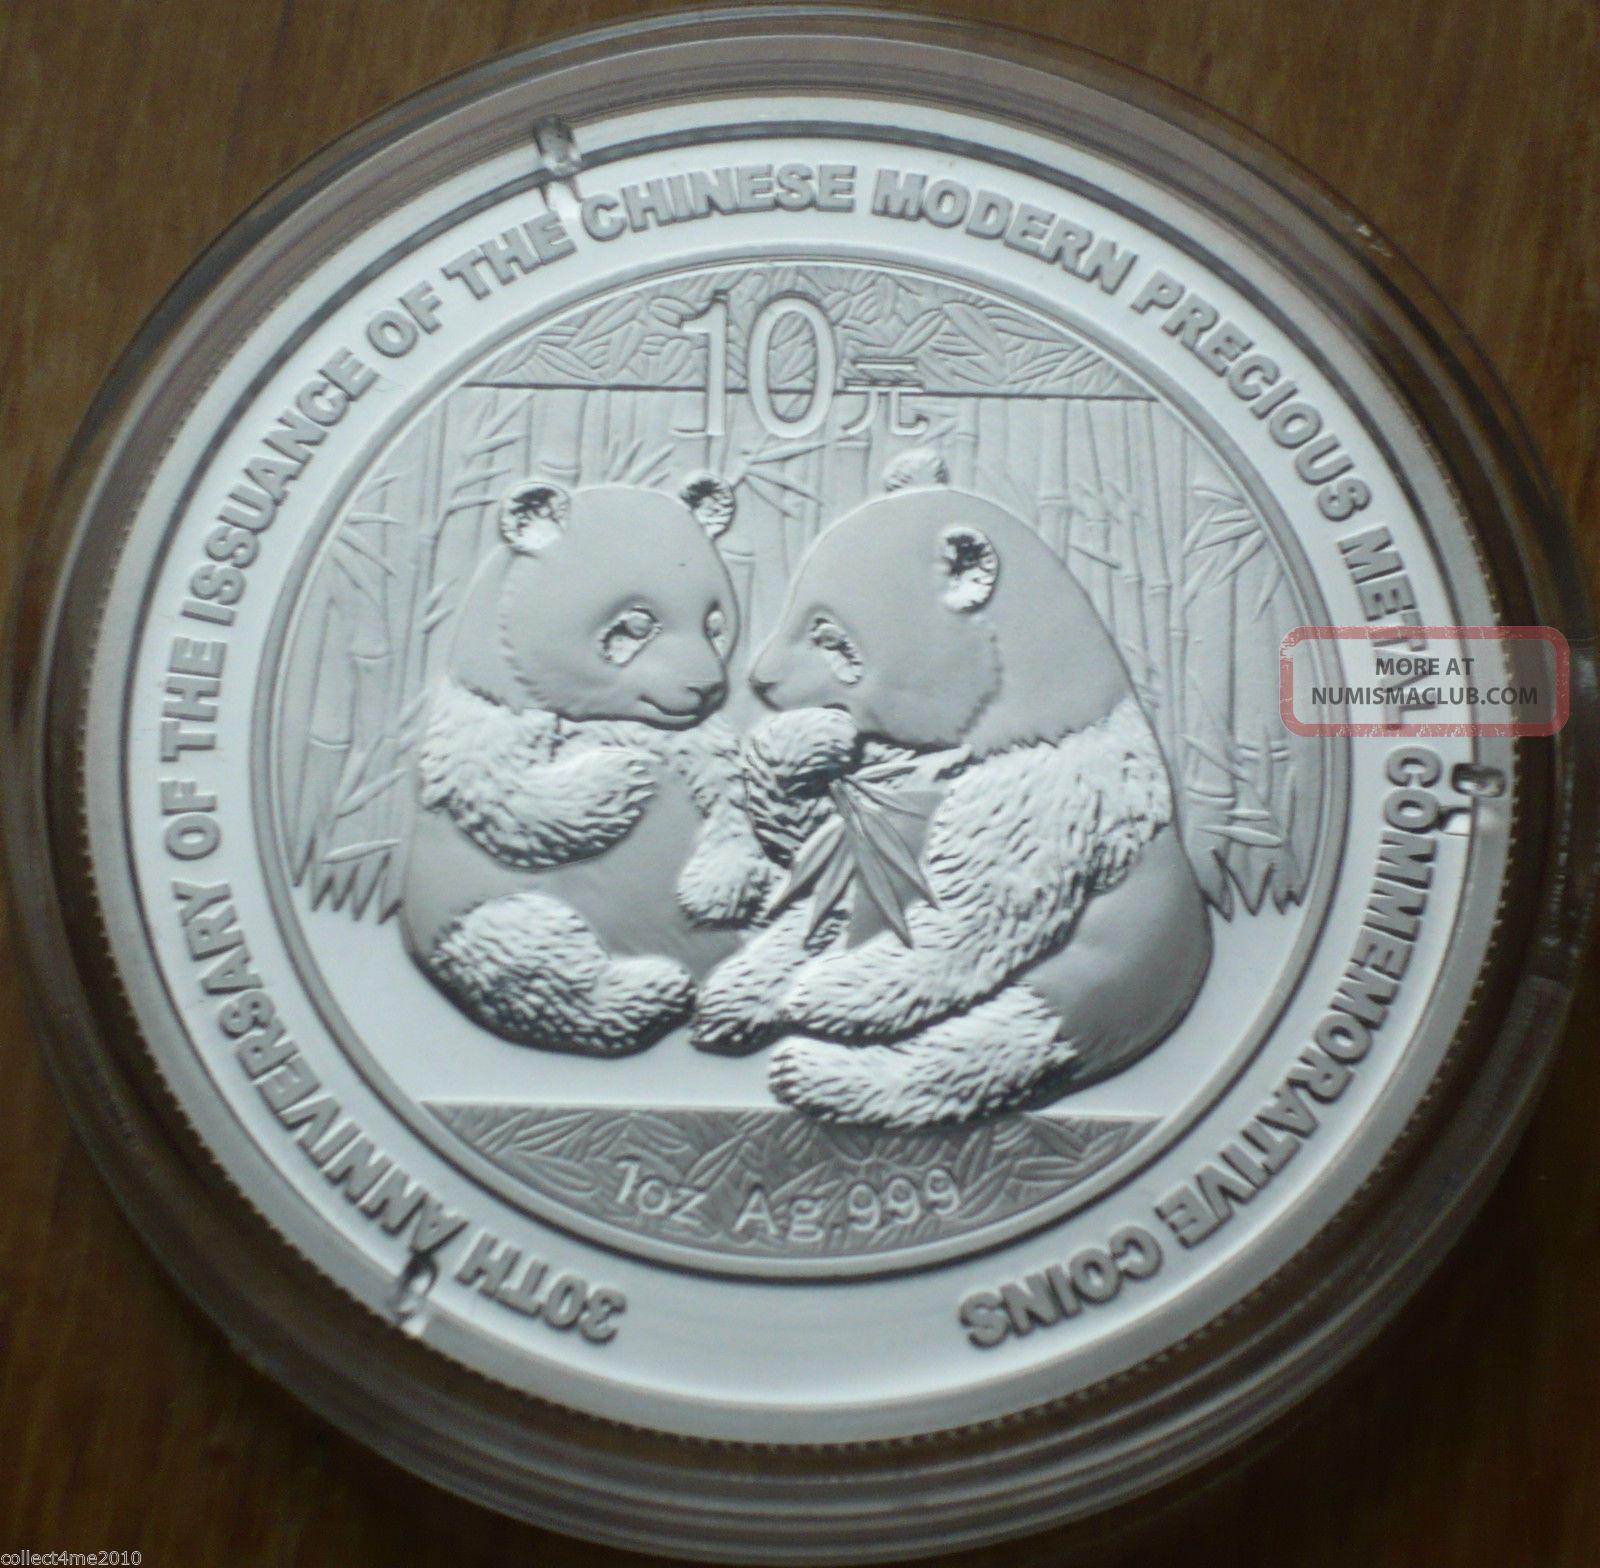 2009 China Panda 30th Anniversary1oz Silver Coin Coins: World photo